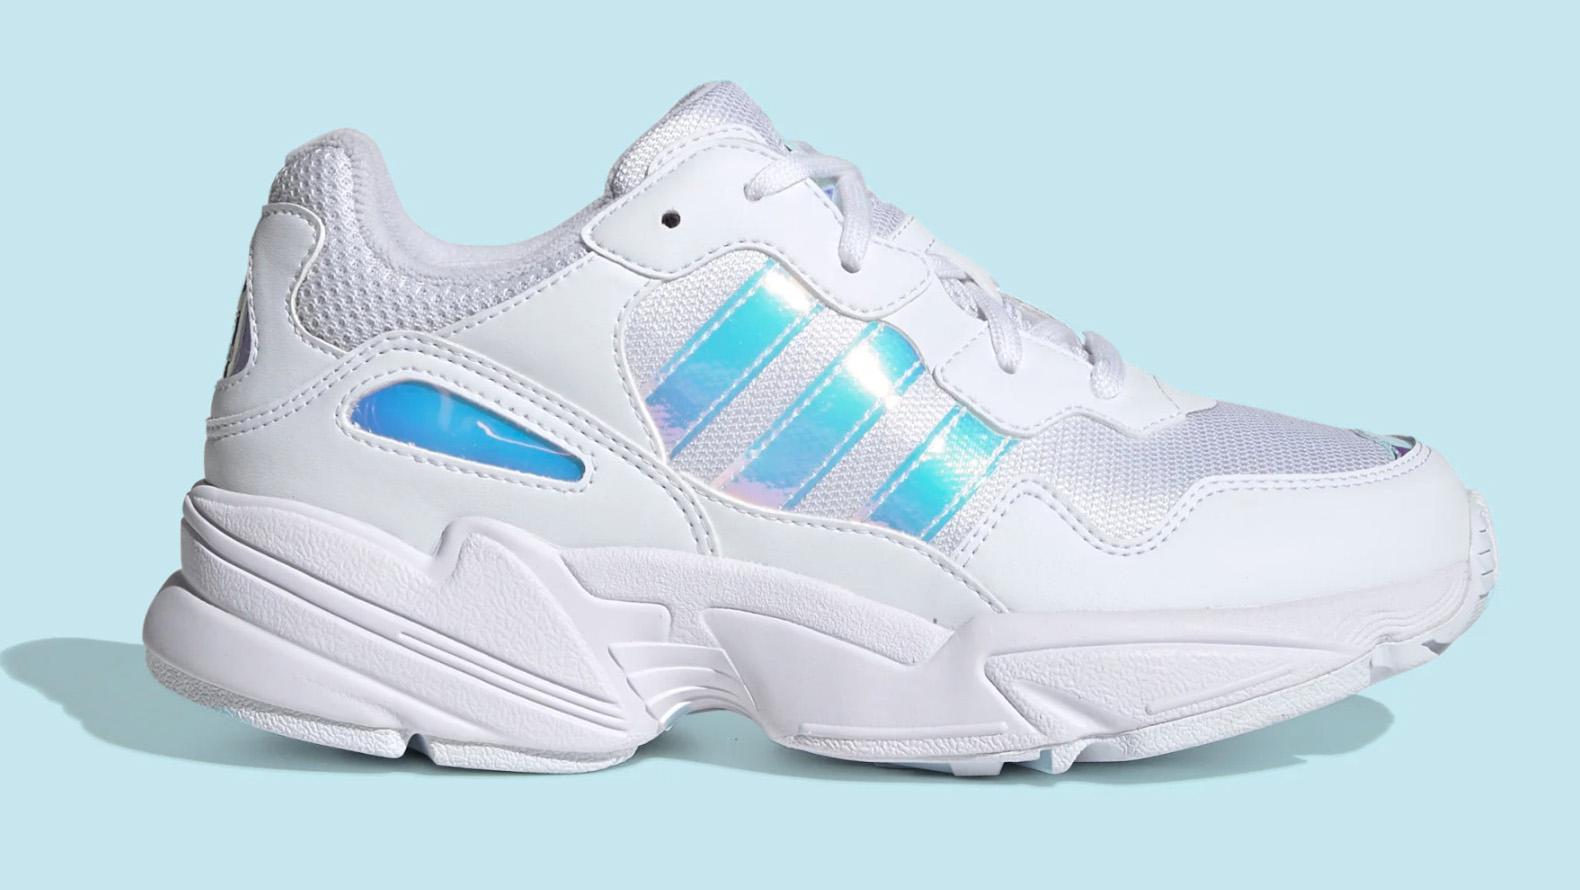 adidas Yung-96 Cloud White iridescent